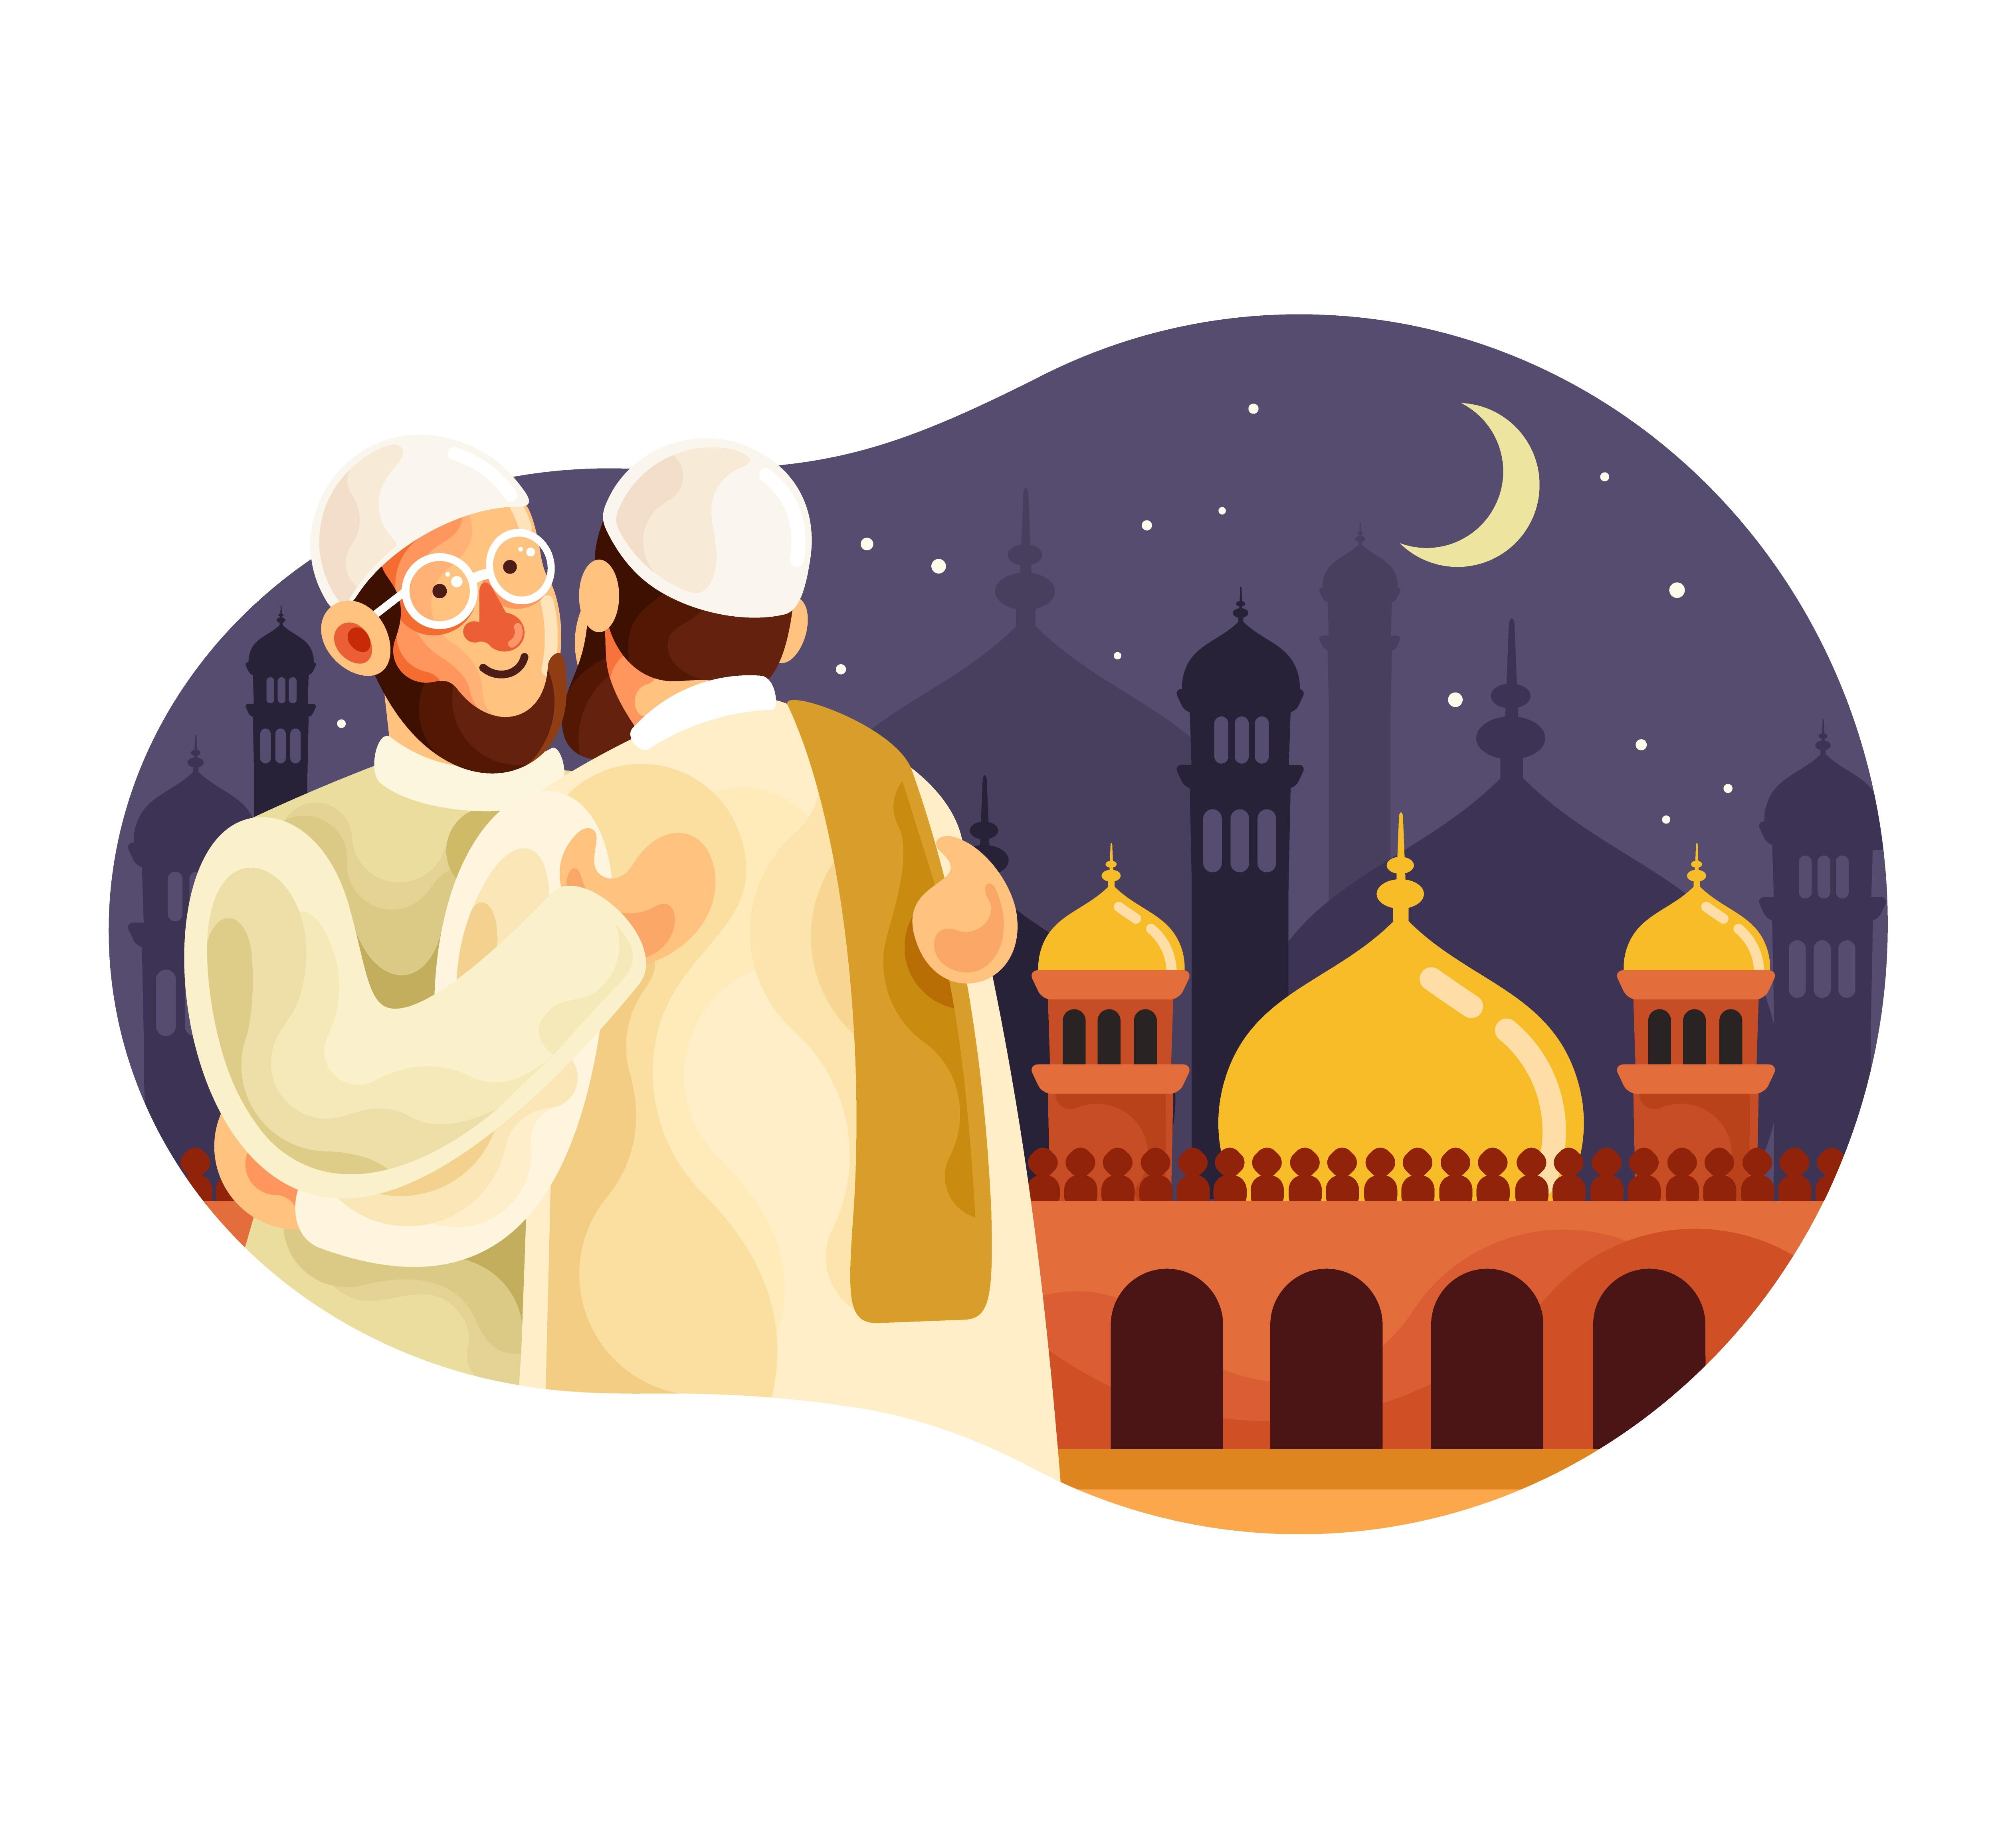 Time of Eid Prayer?